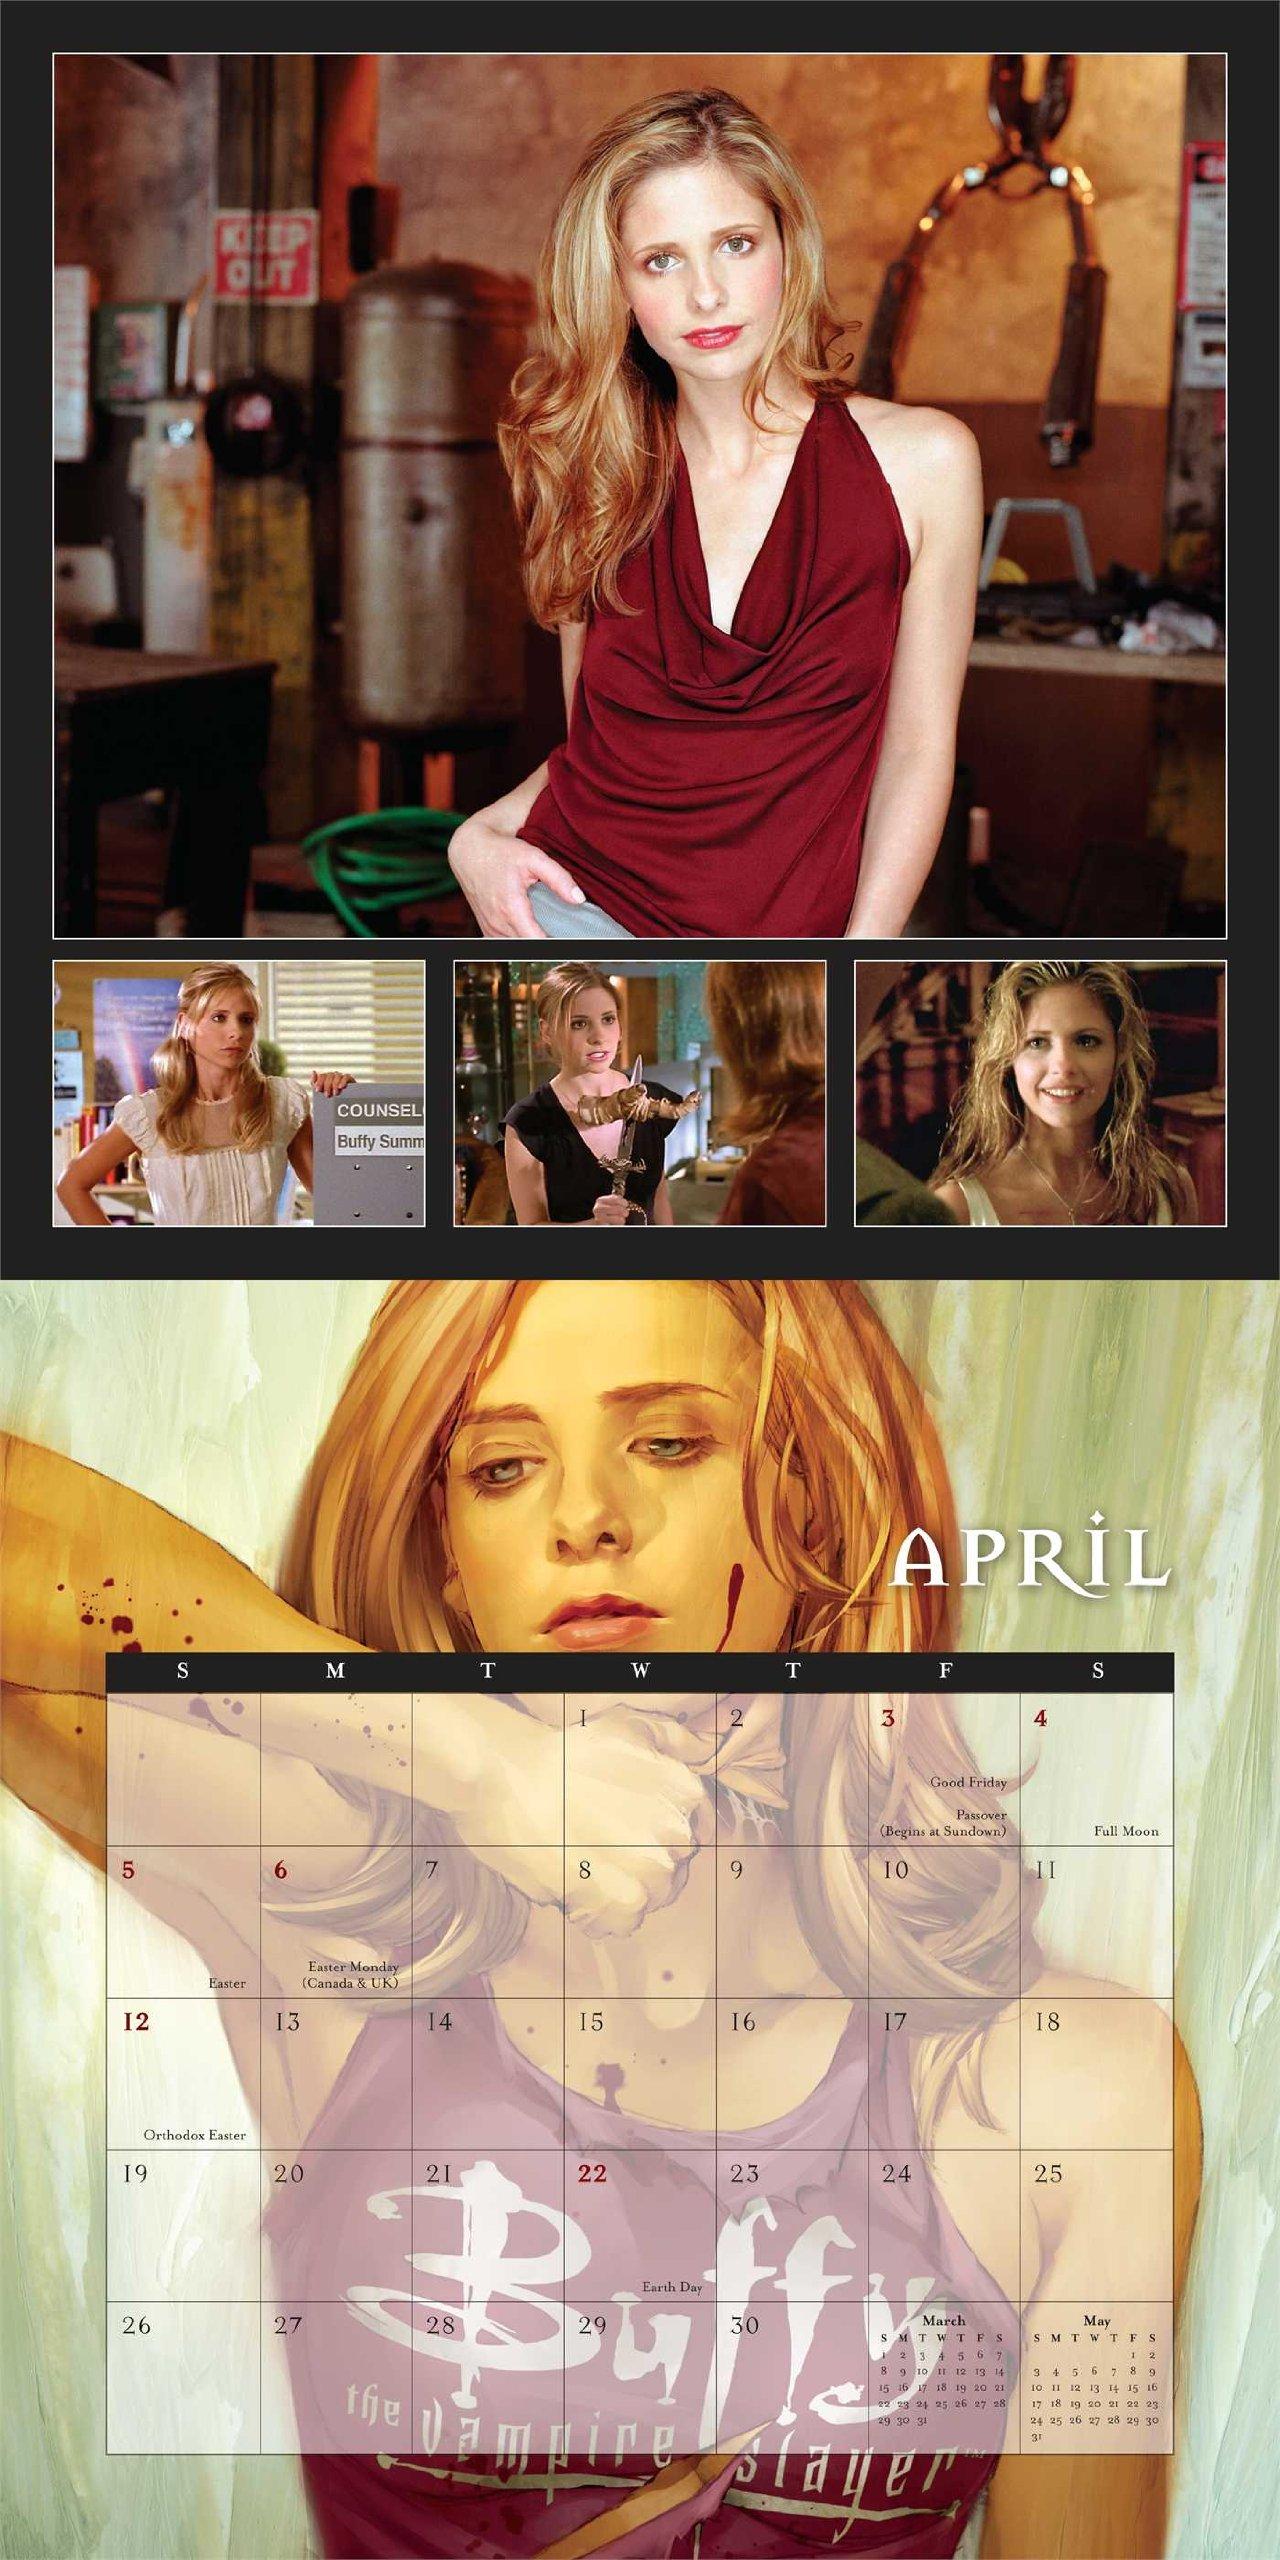 Buffy the Vampire Slayer 2015 Wall Calendar: 20th Century Fox:  9780789328229: Amazon.com: Books